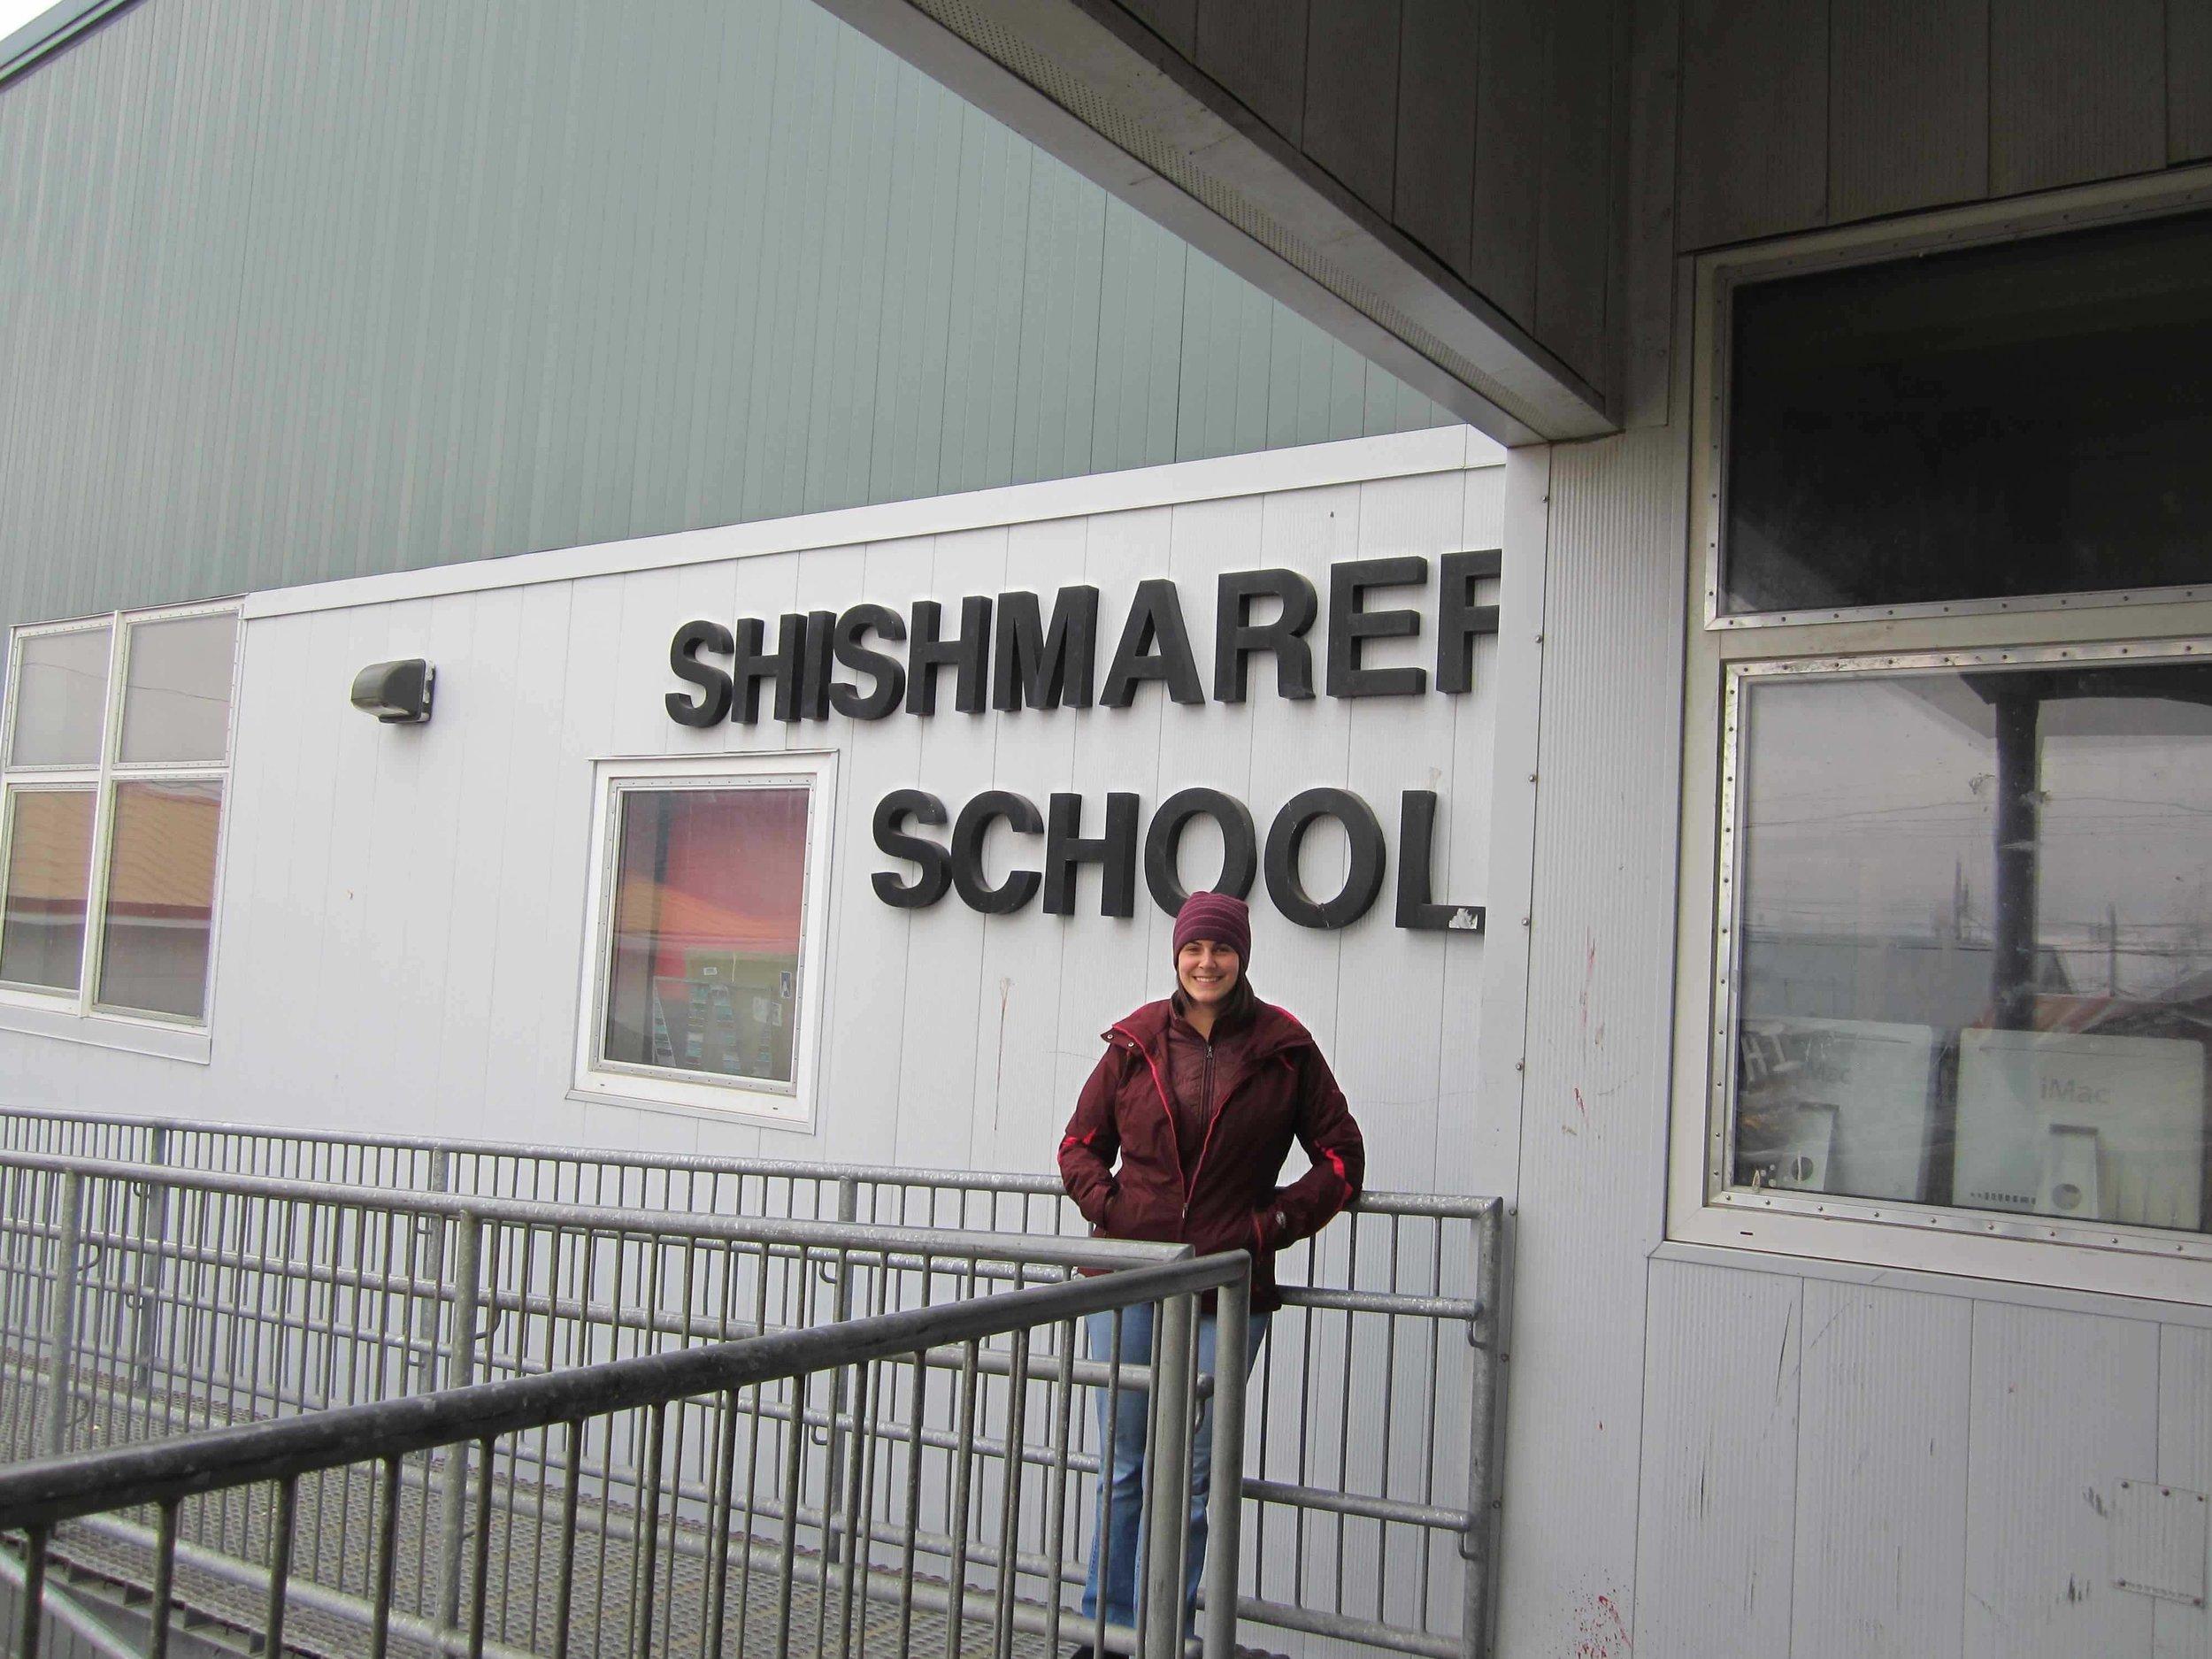 Shishmaref, AK on a disappearing coastal island ( 66° 15′ N)